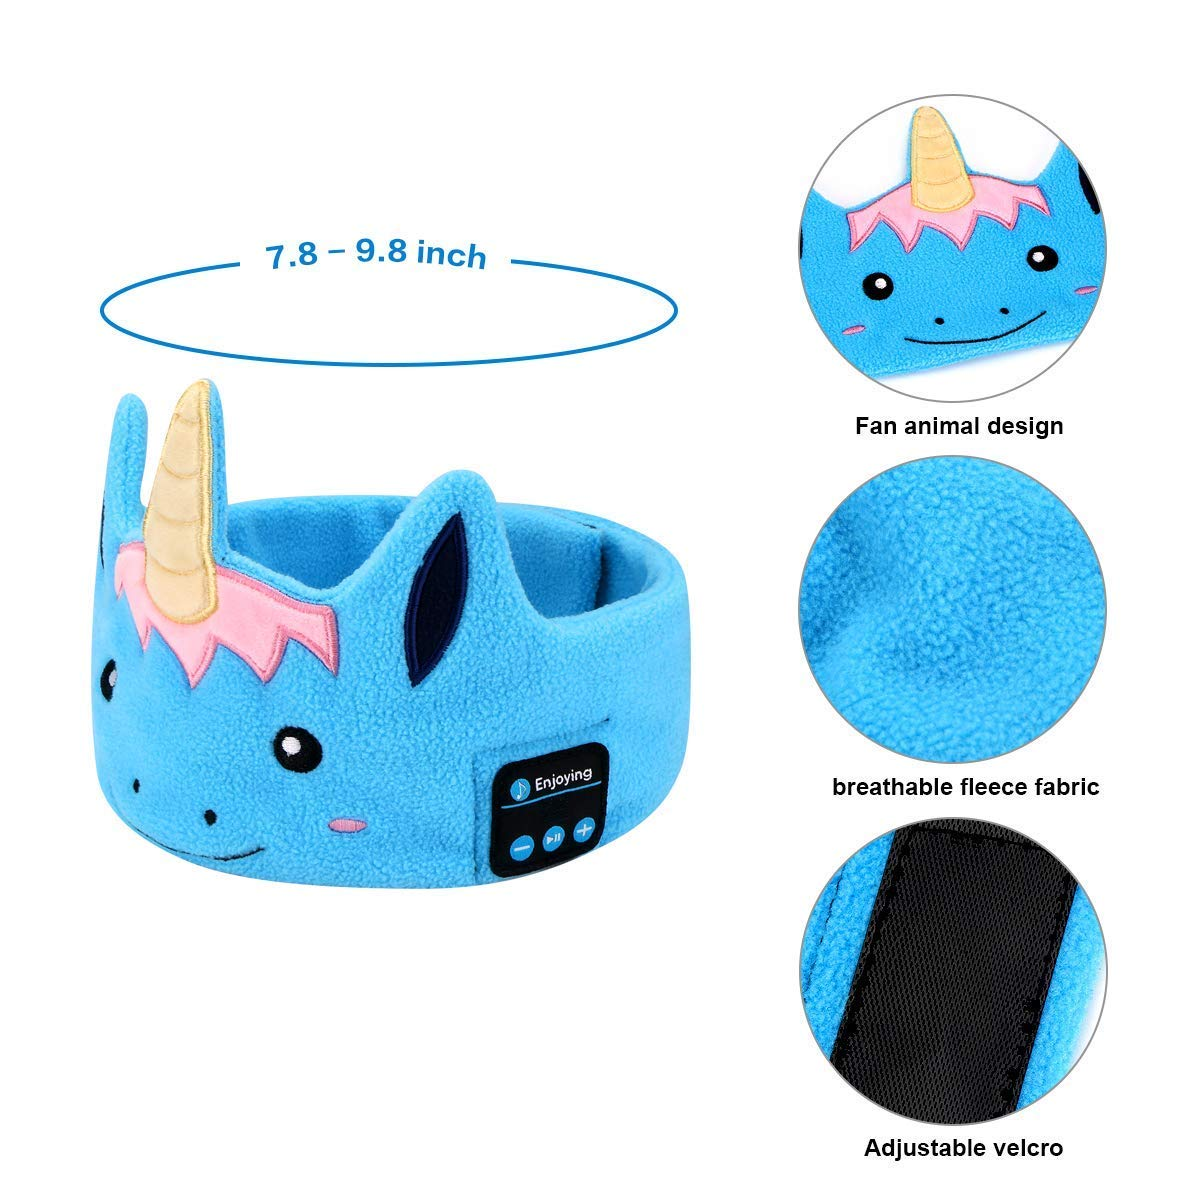 WU-MINGLU Kids Headband Headphones, Wireless Bluetooth Music Soft Fleece Headband Children\'s Headband Earphones Sleep Headphones Built-in Mic Adjustable Washable For Home, Travel